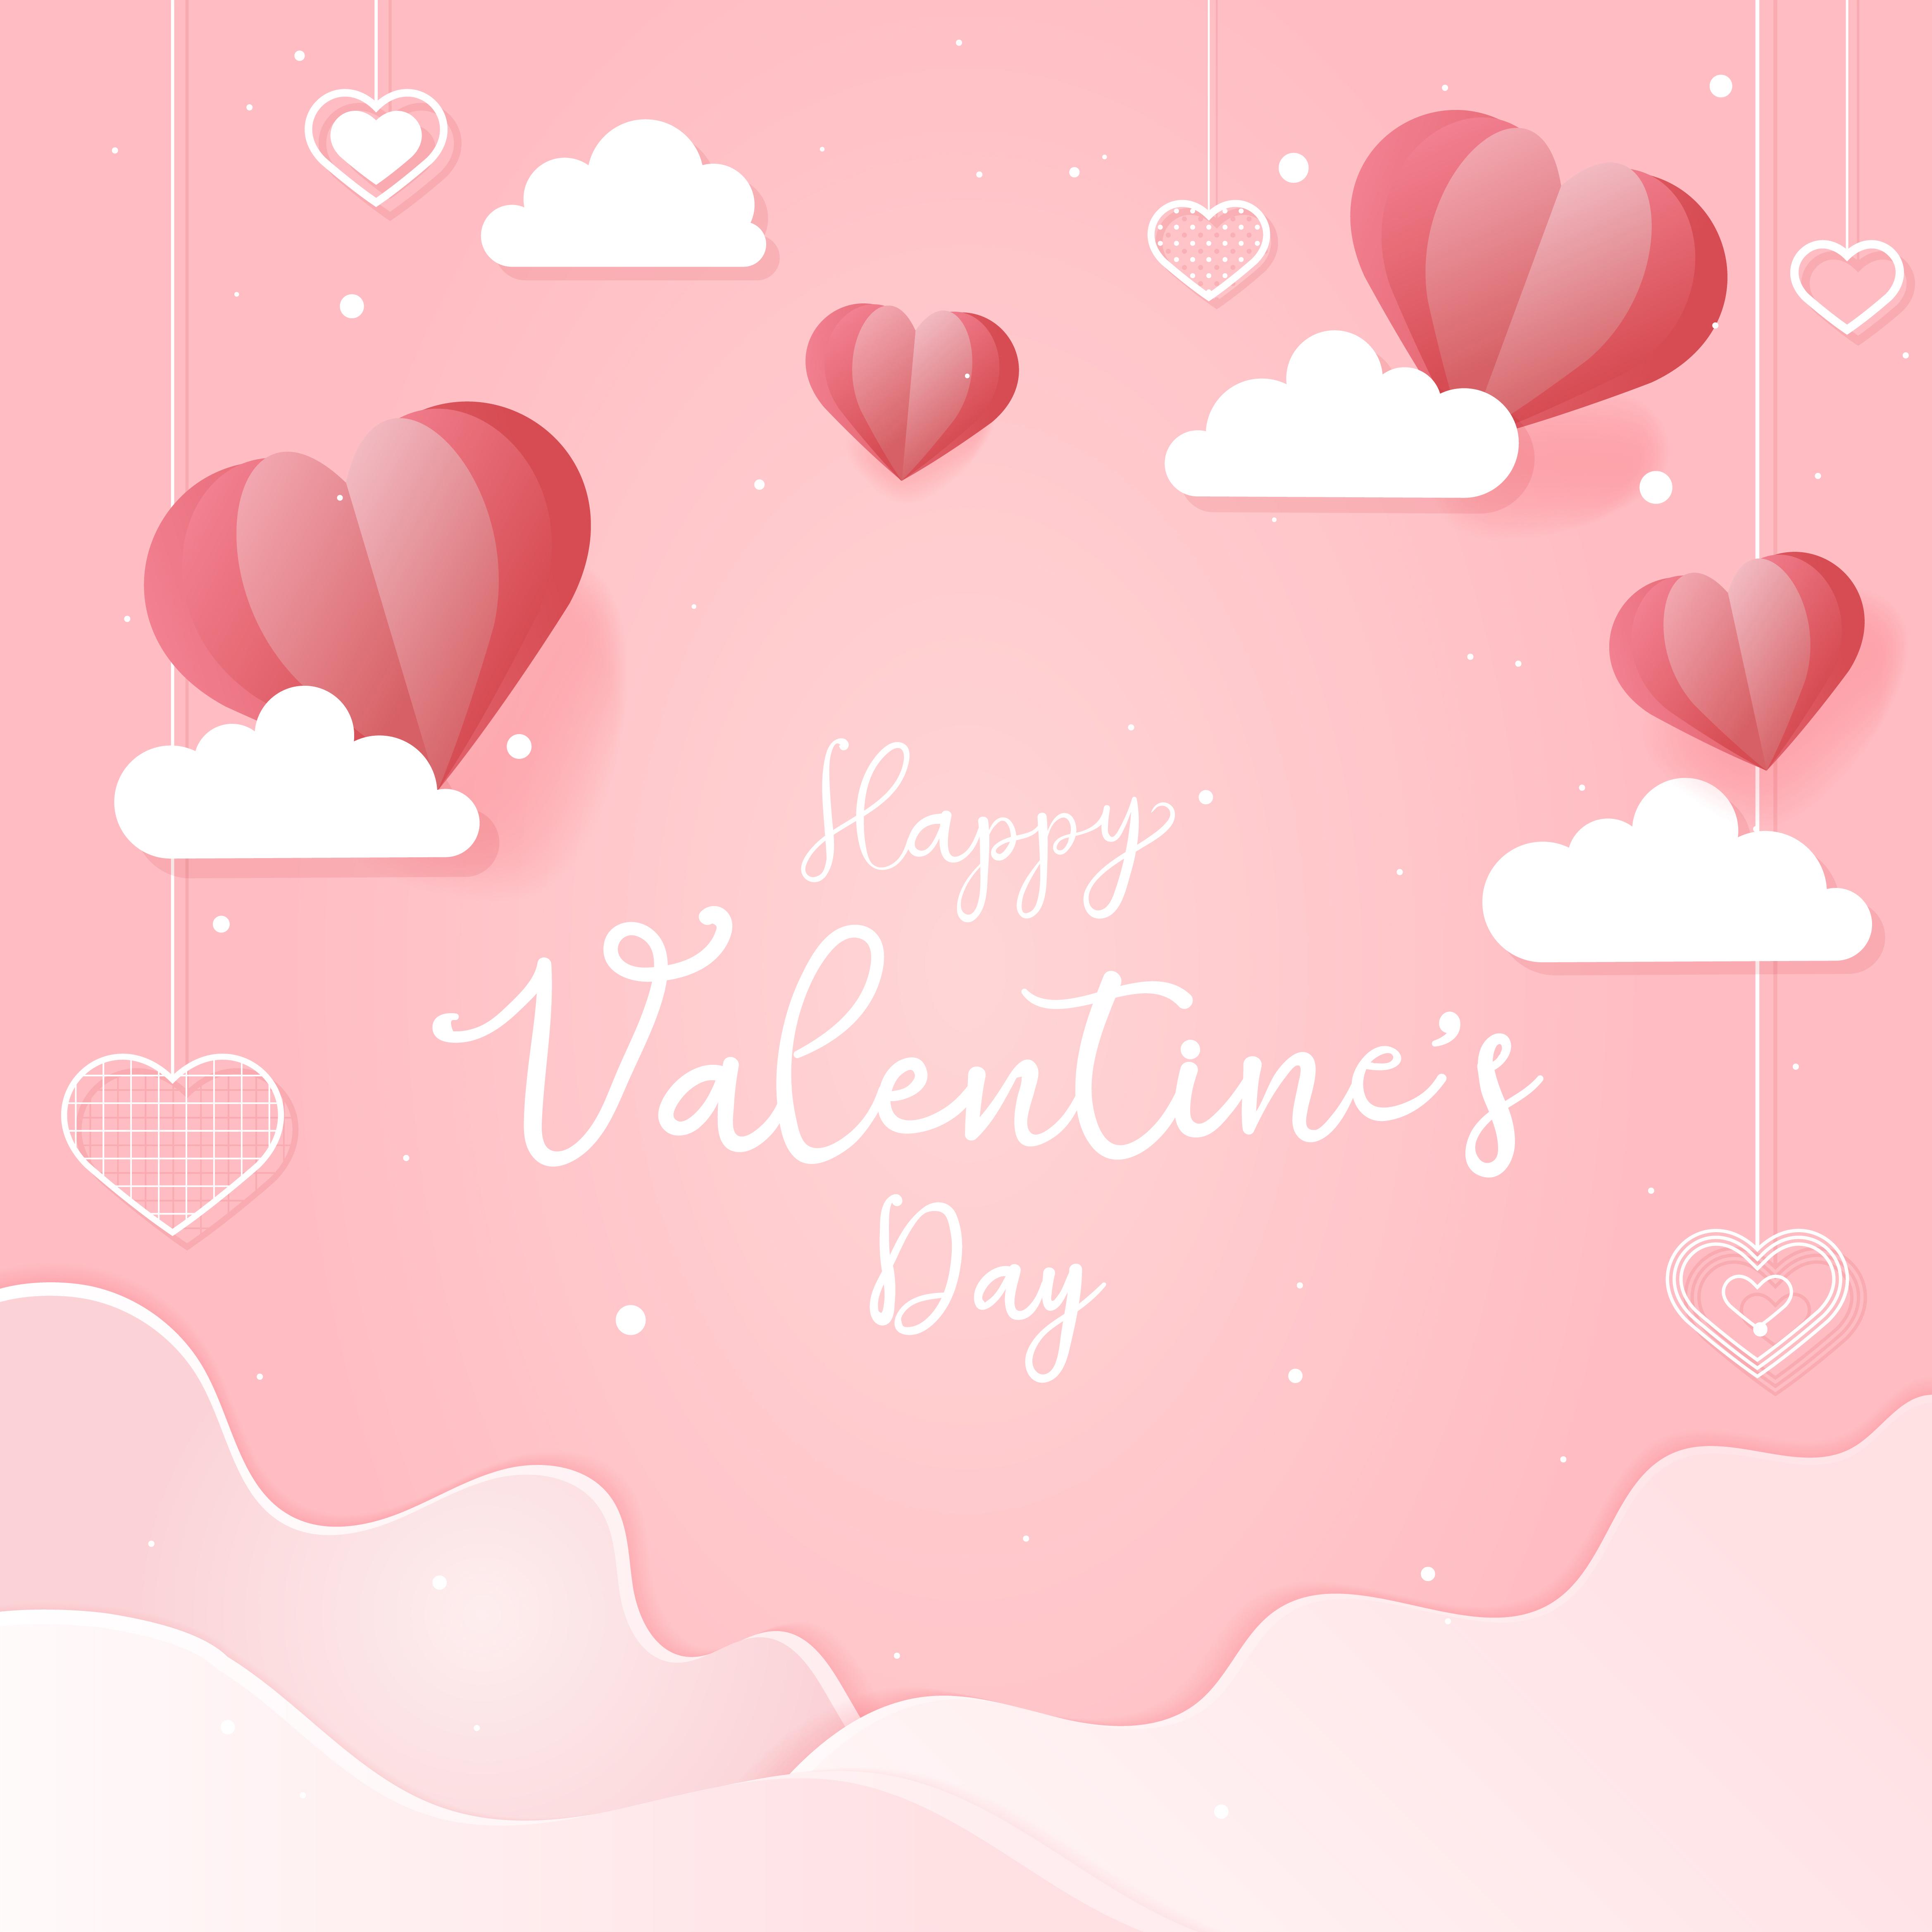 valentine's day card illustration  download free vectors